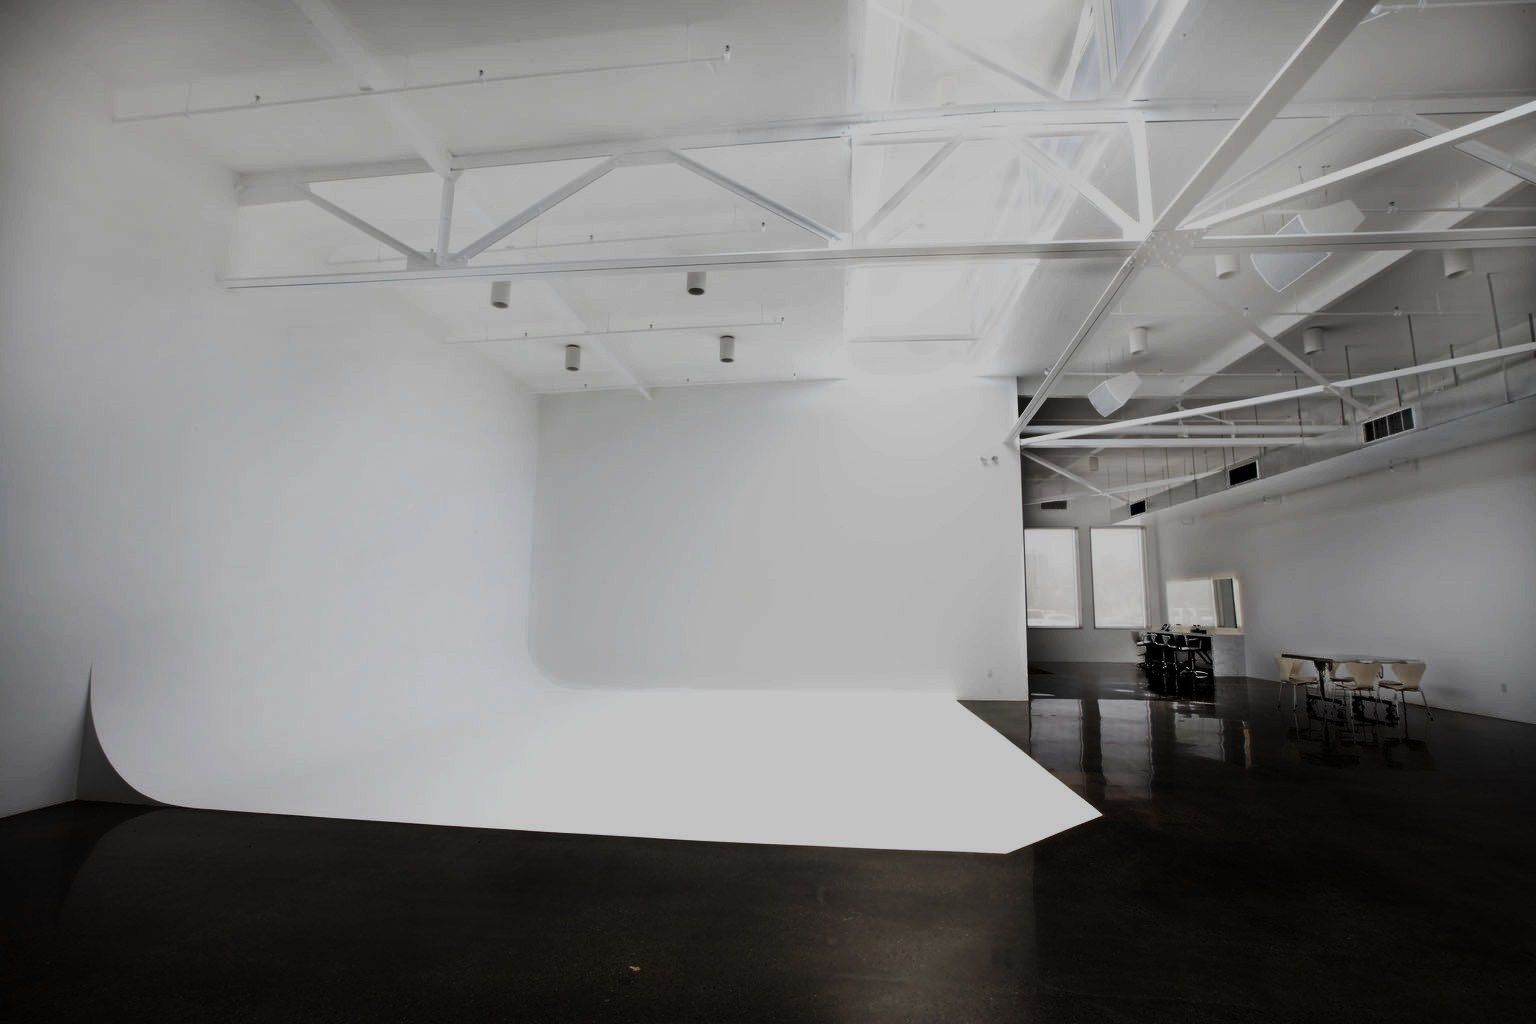 Cyc Wall Advanced Studio Technologies 818 982 5770 Photo Studio Studio Space Studio